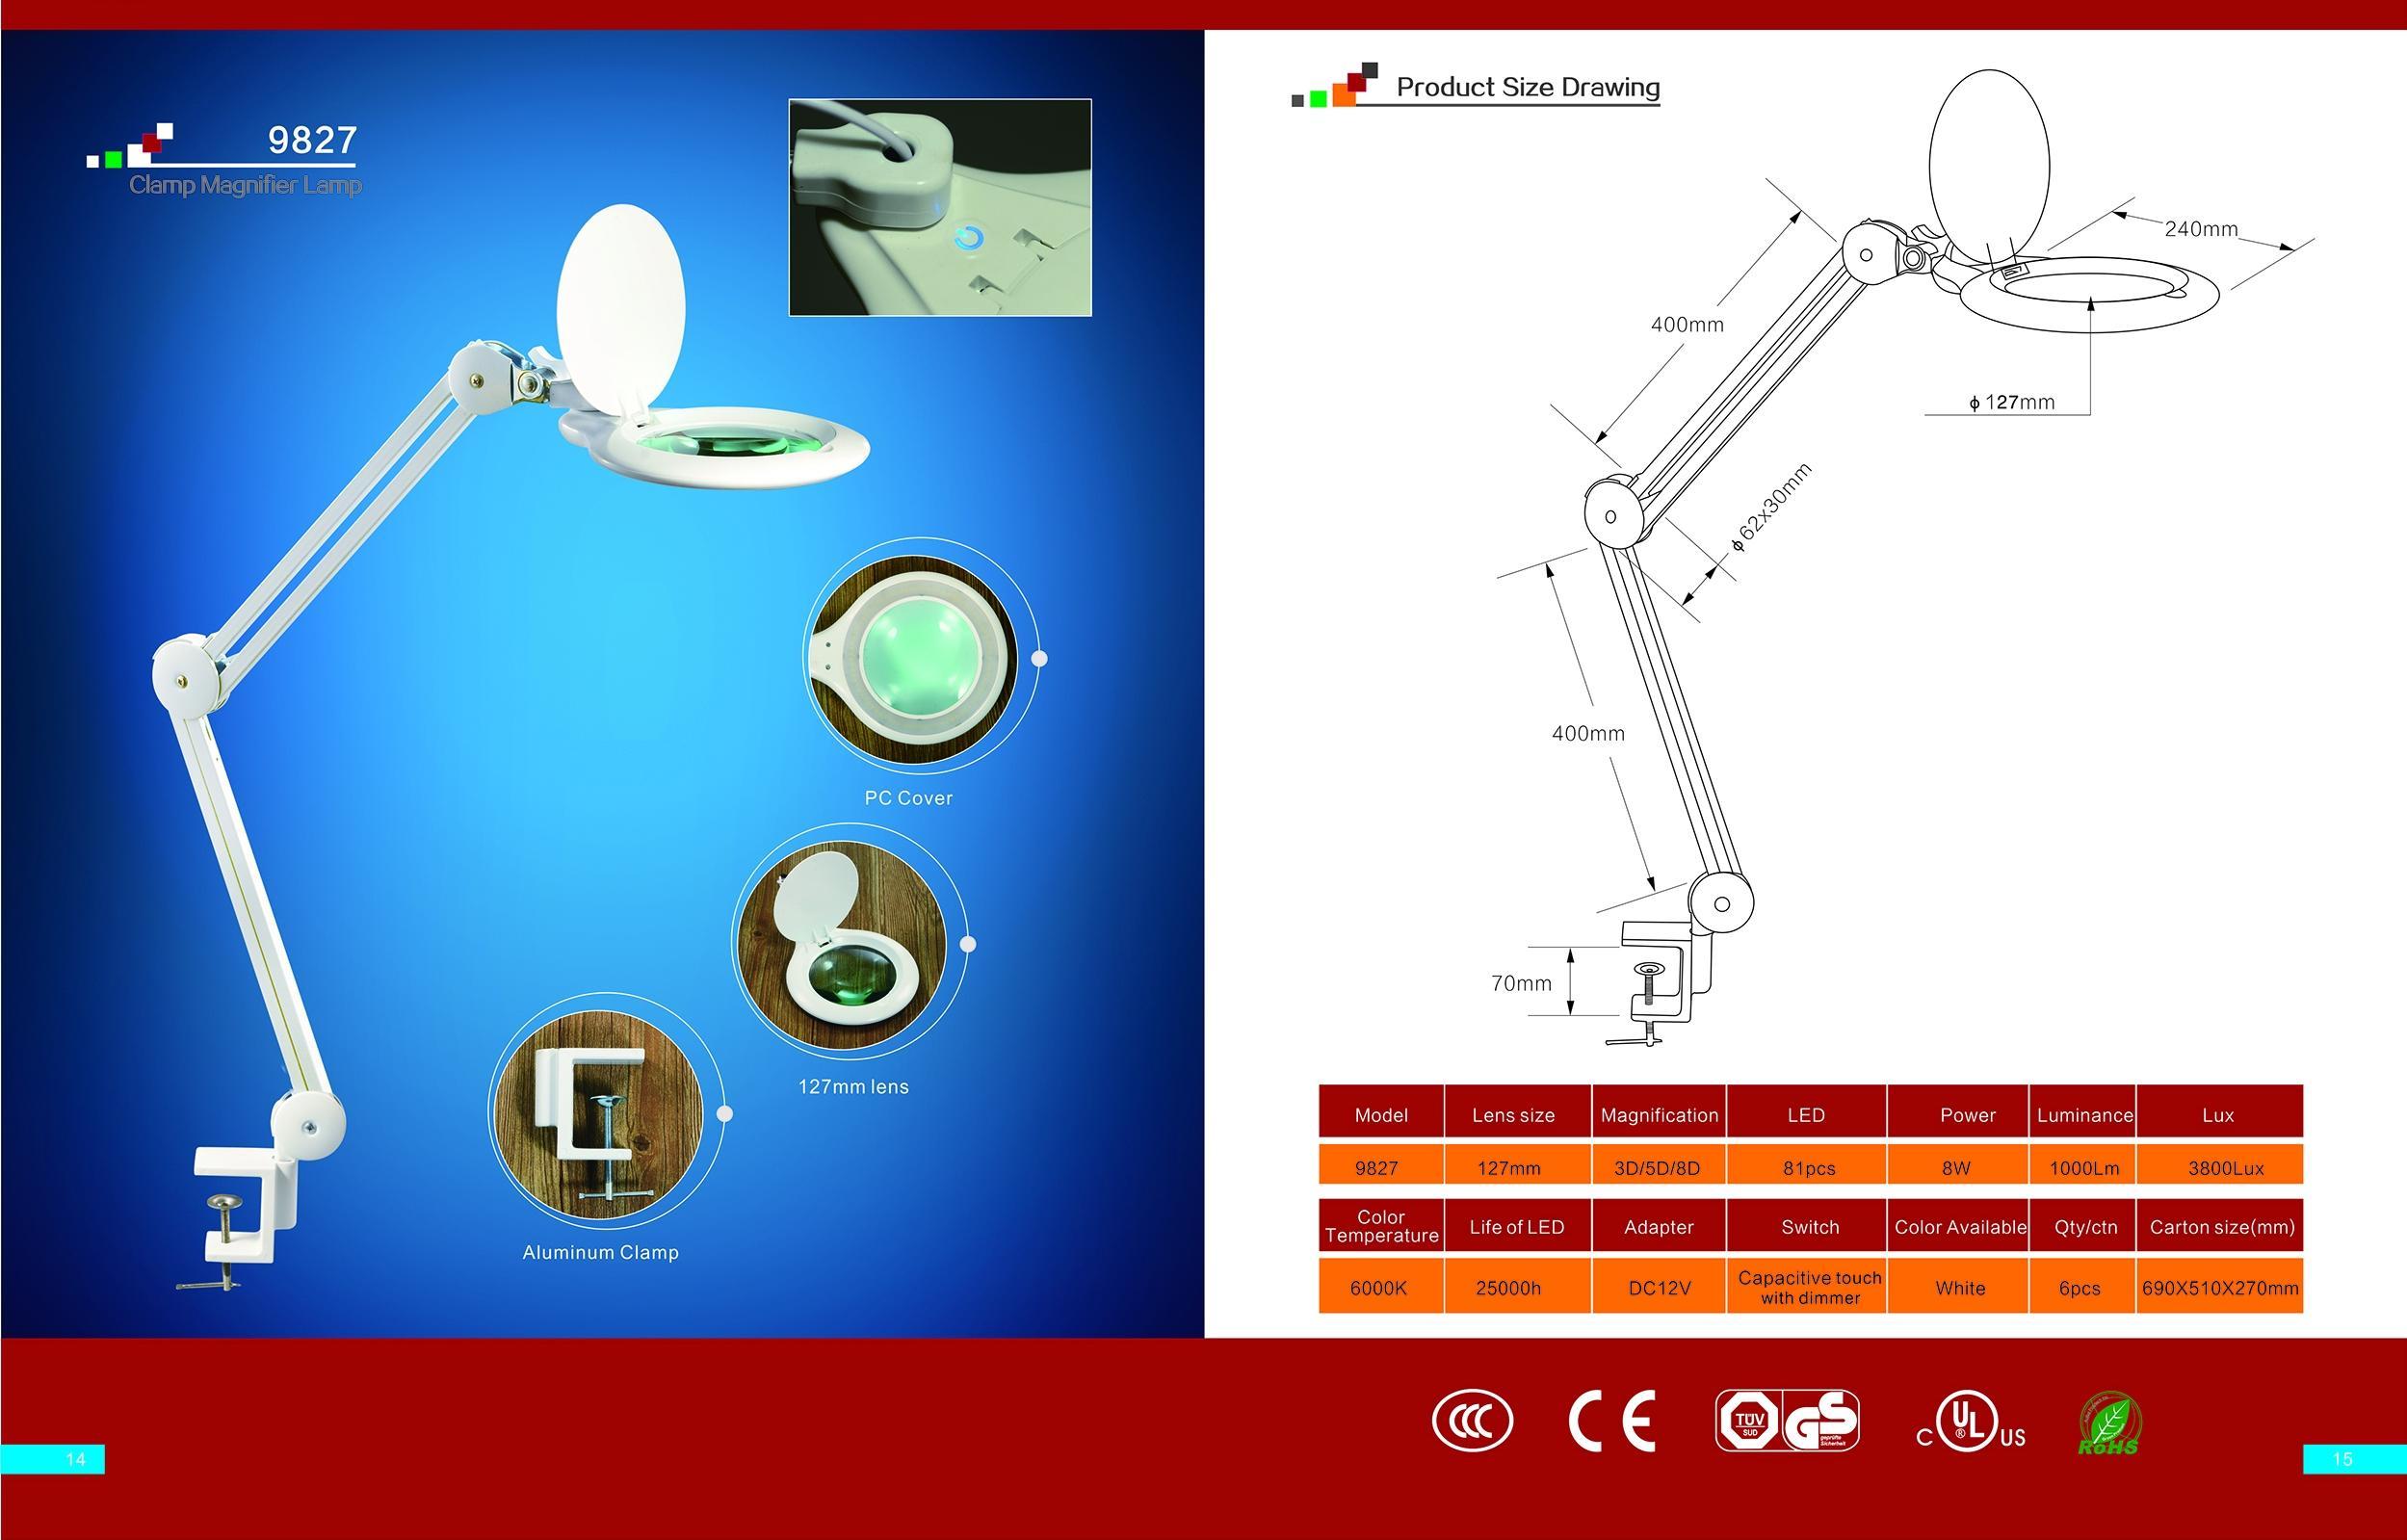 Saftecgt; Magnifying Lampsillumination Magnifyers Etc Vision NvmwO8n0